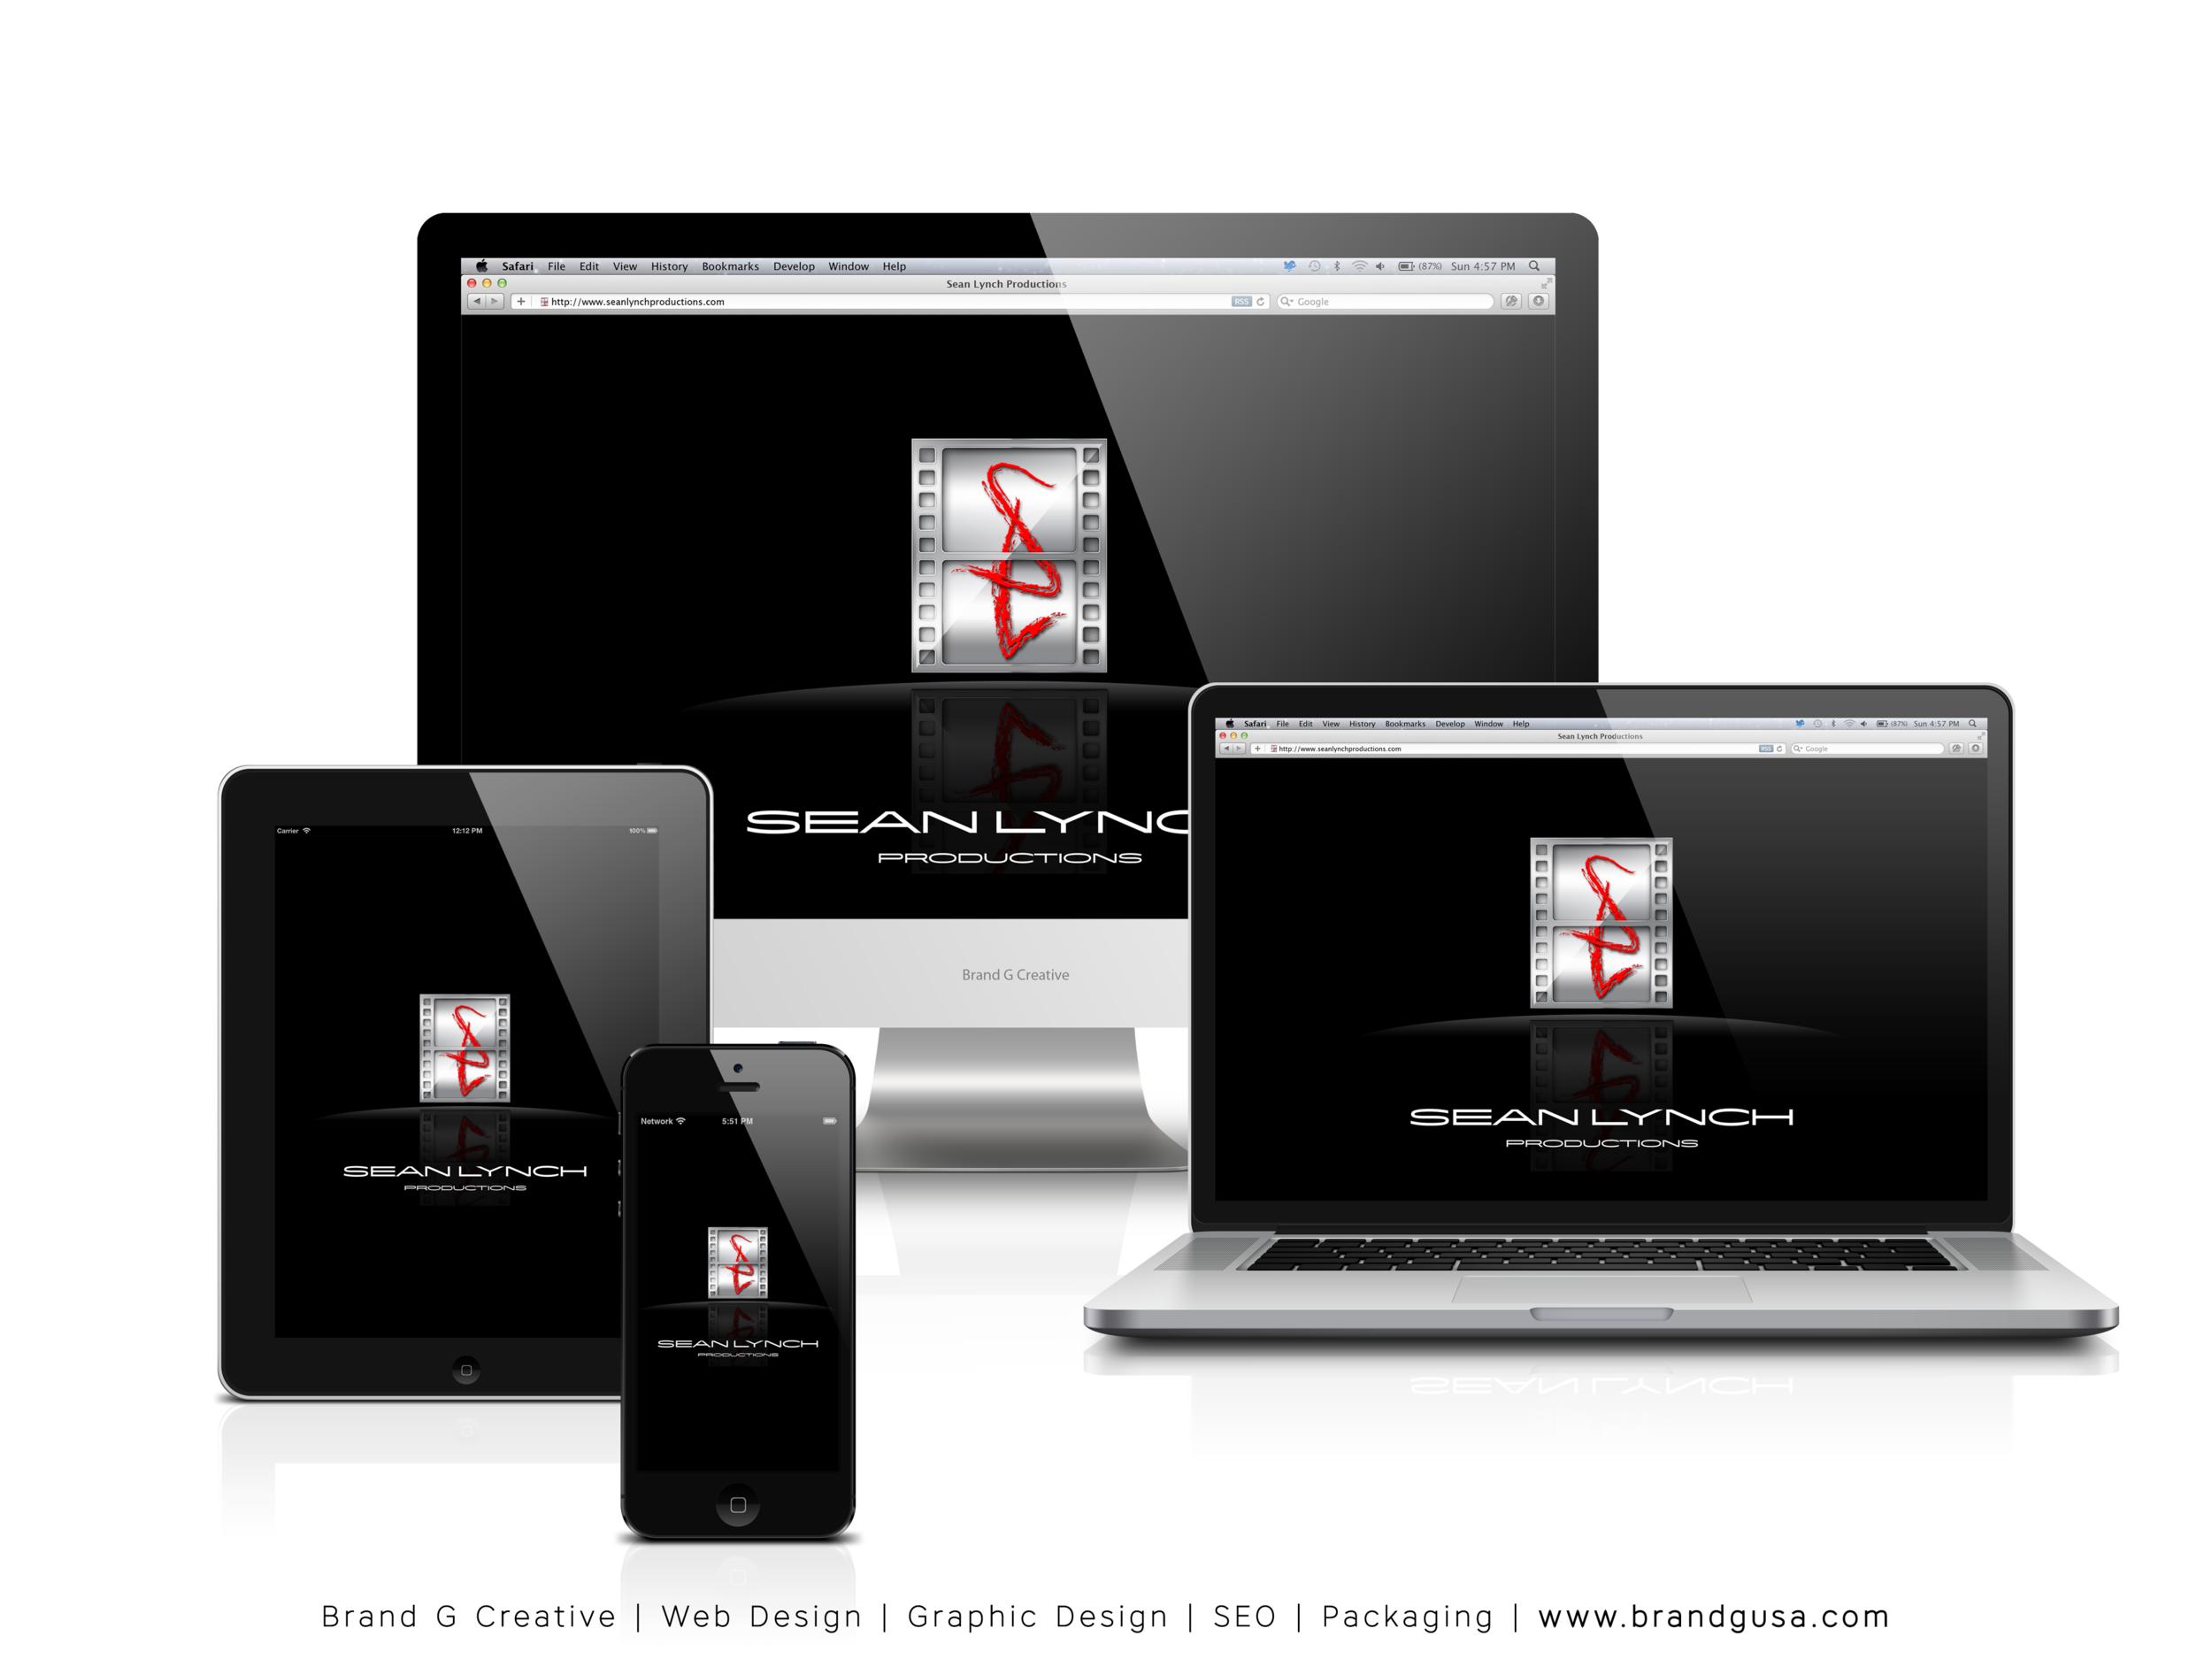 Brand G Creative Web Design Versions